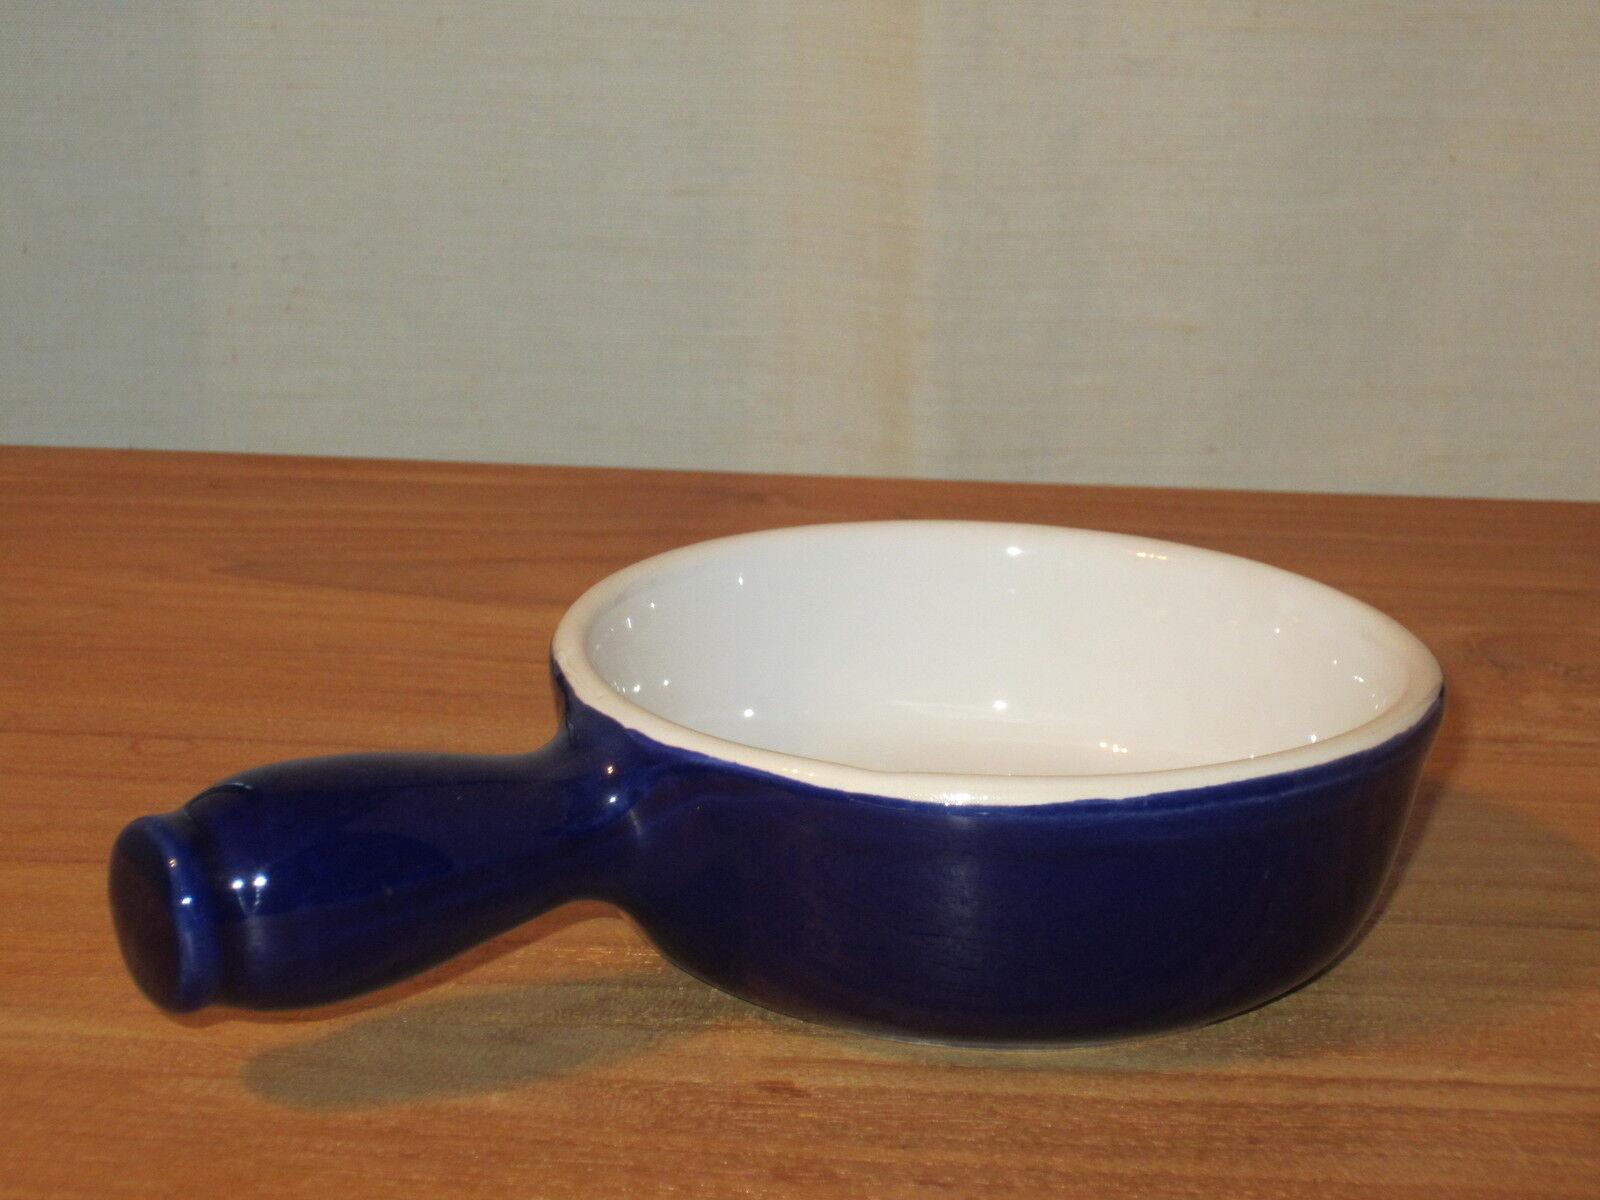 EMILE HENRY NEW Bleu Cobalt Set 6 Caquelons 10cm